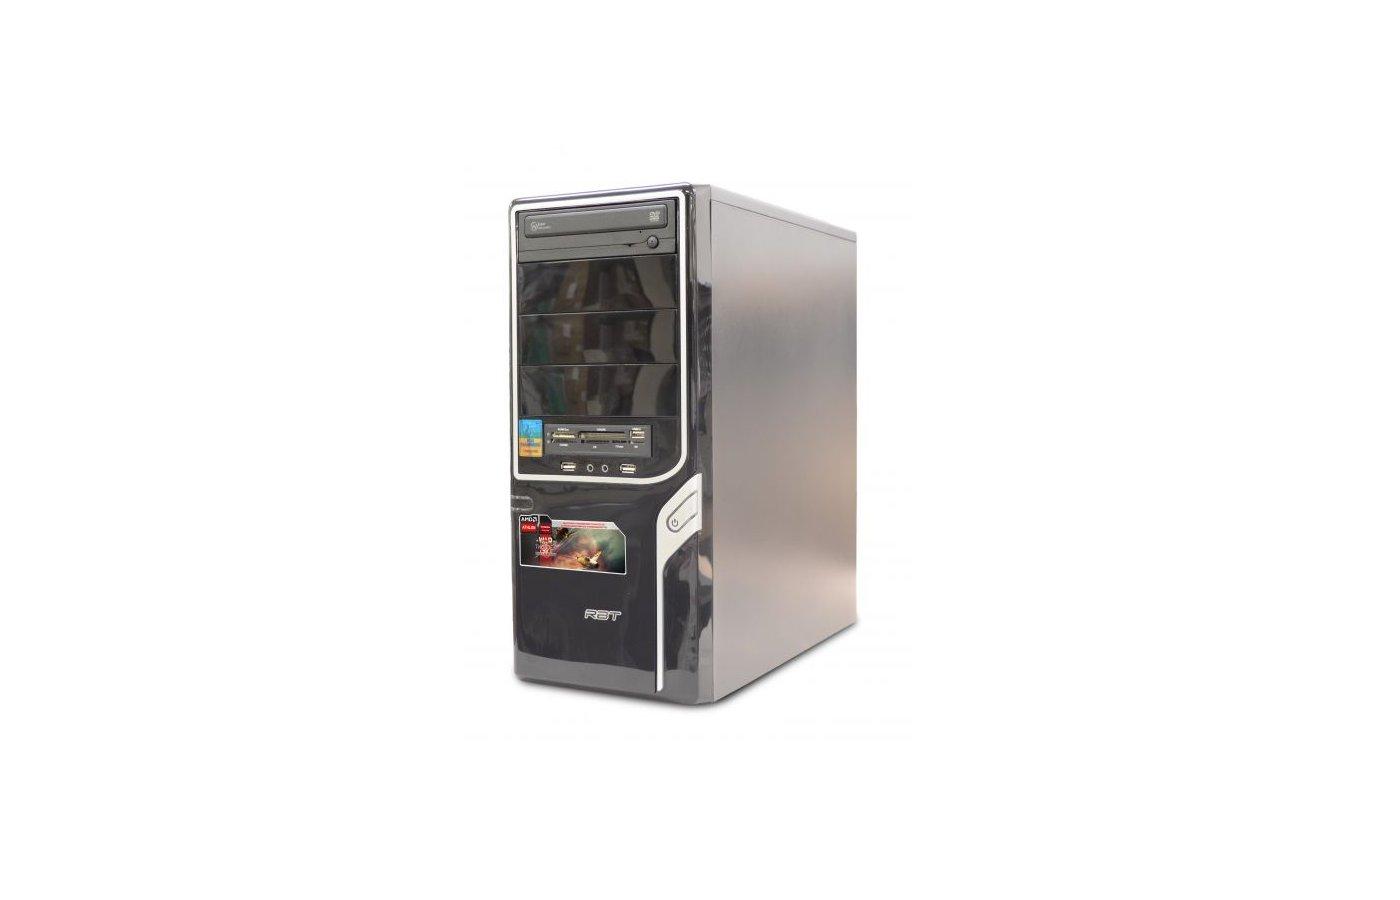 Системный блок РБТ R238 AMD A4 5300 X2 3.4Gh/4Gb/500Gb/R7 240-1GB/DVD-RW/CR/Linux